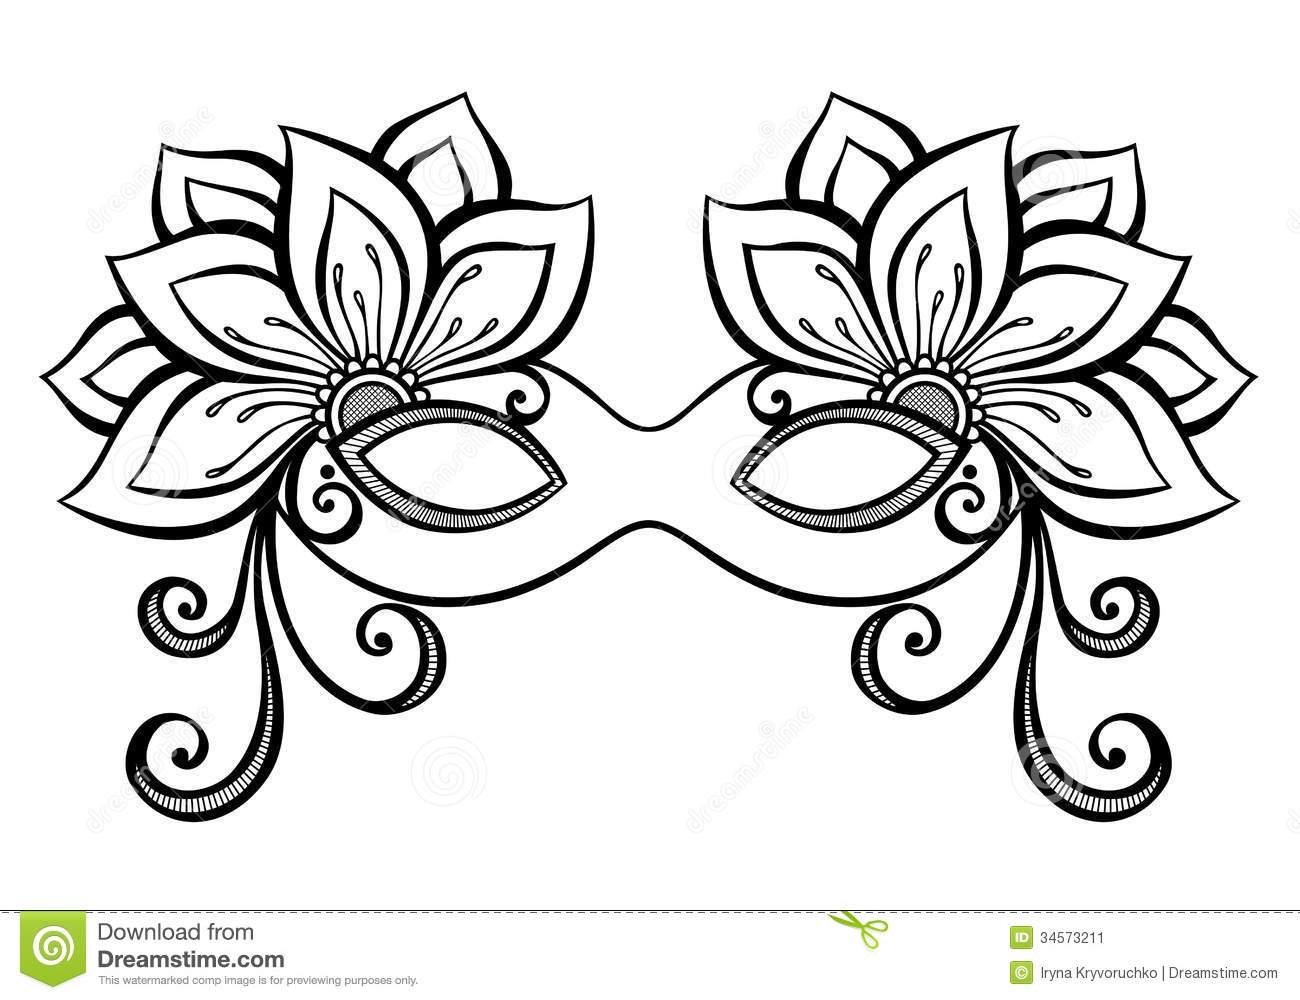 Masquerade coloring #18, Download drawings